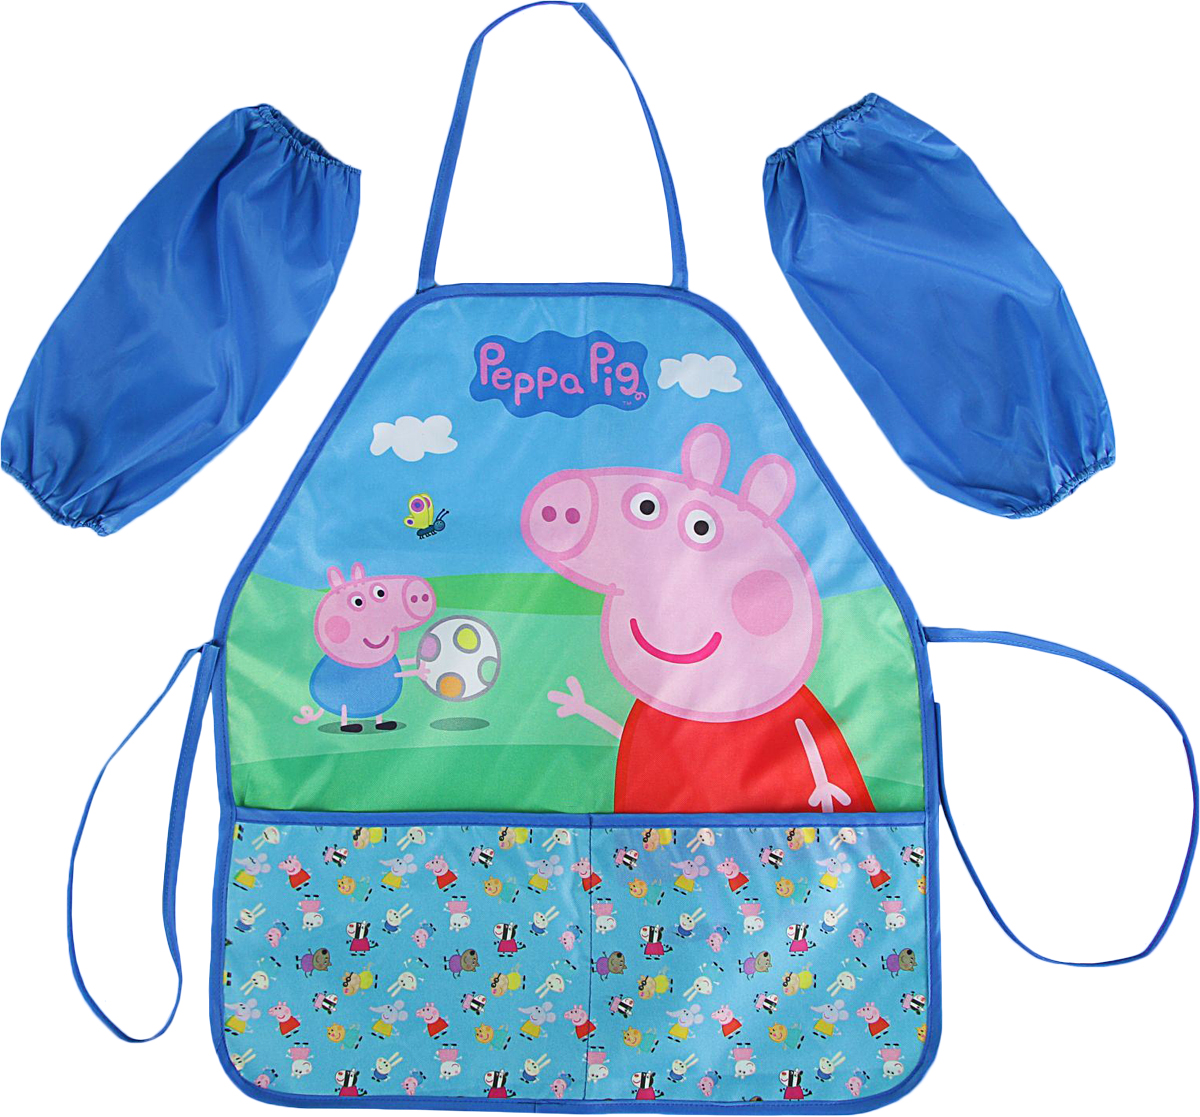 Peppa Pig Фартук детский для труда Пикник -  Аксессуары для труда